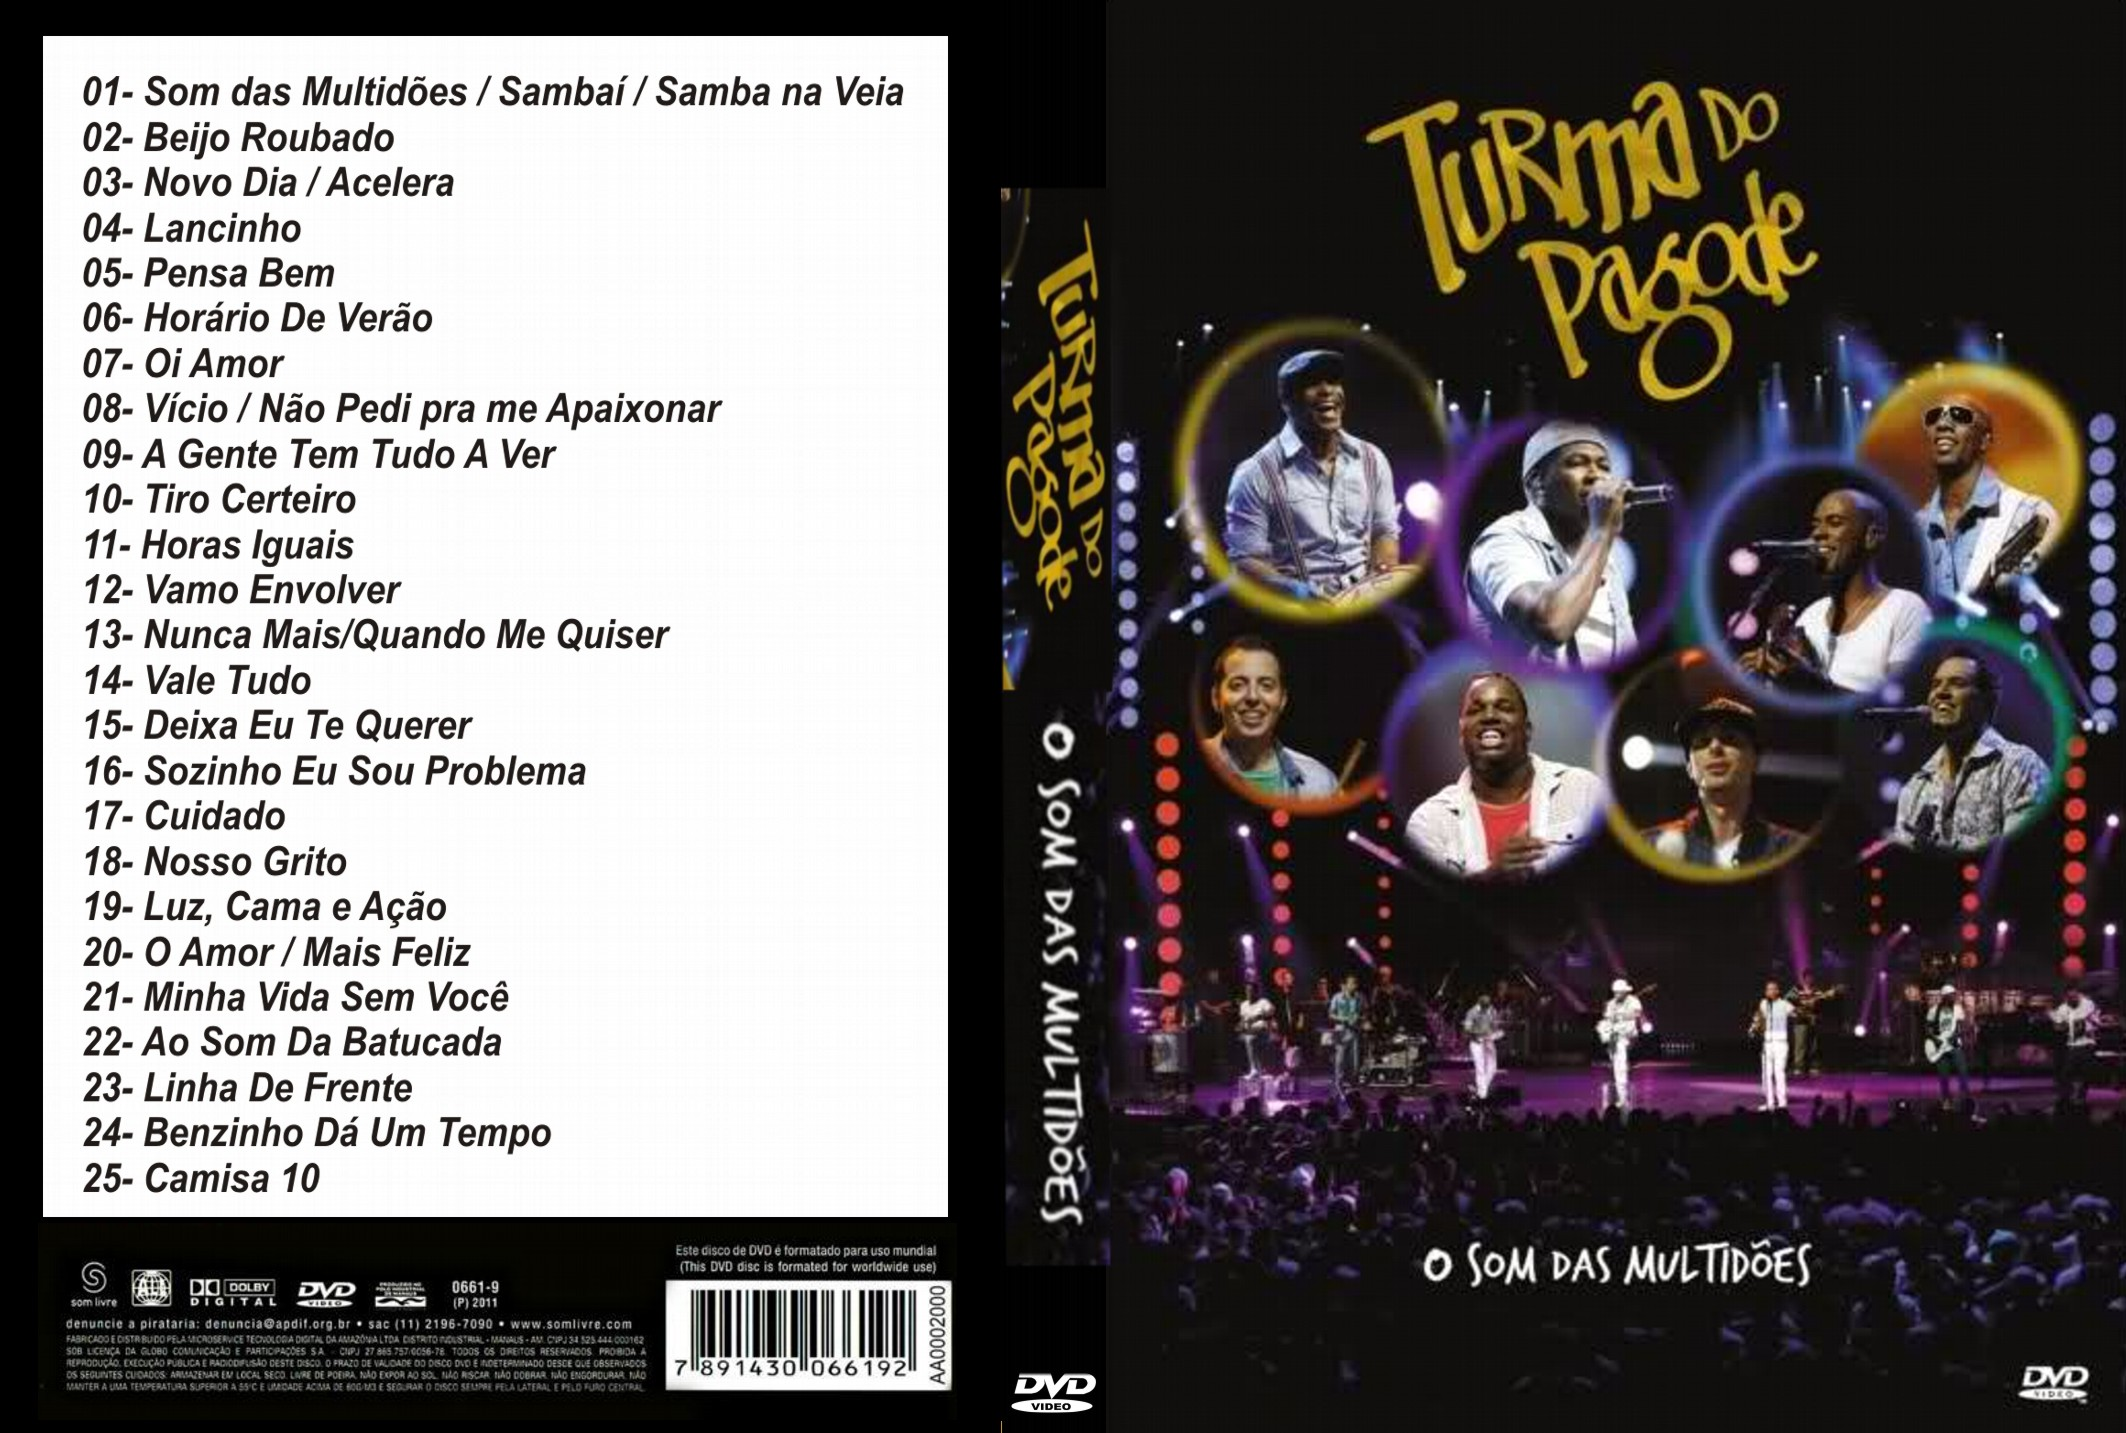 BAIXAR 2012 GRATIS CD DO PAGODE TURMA